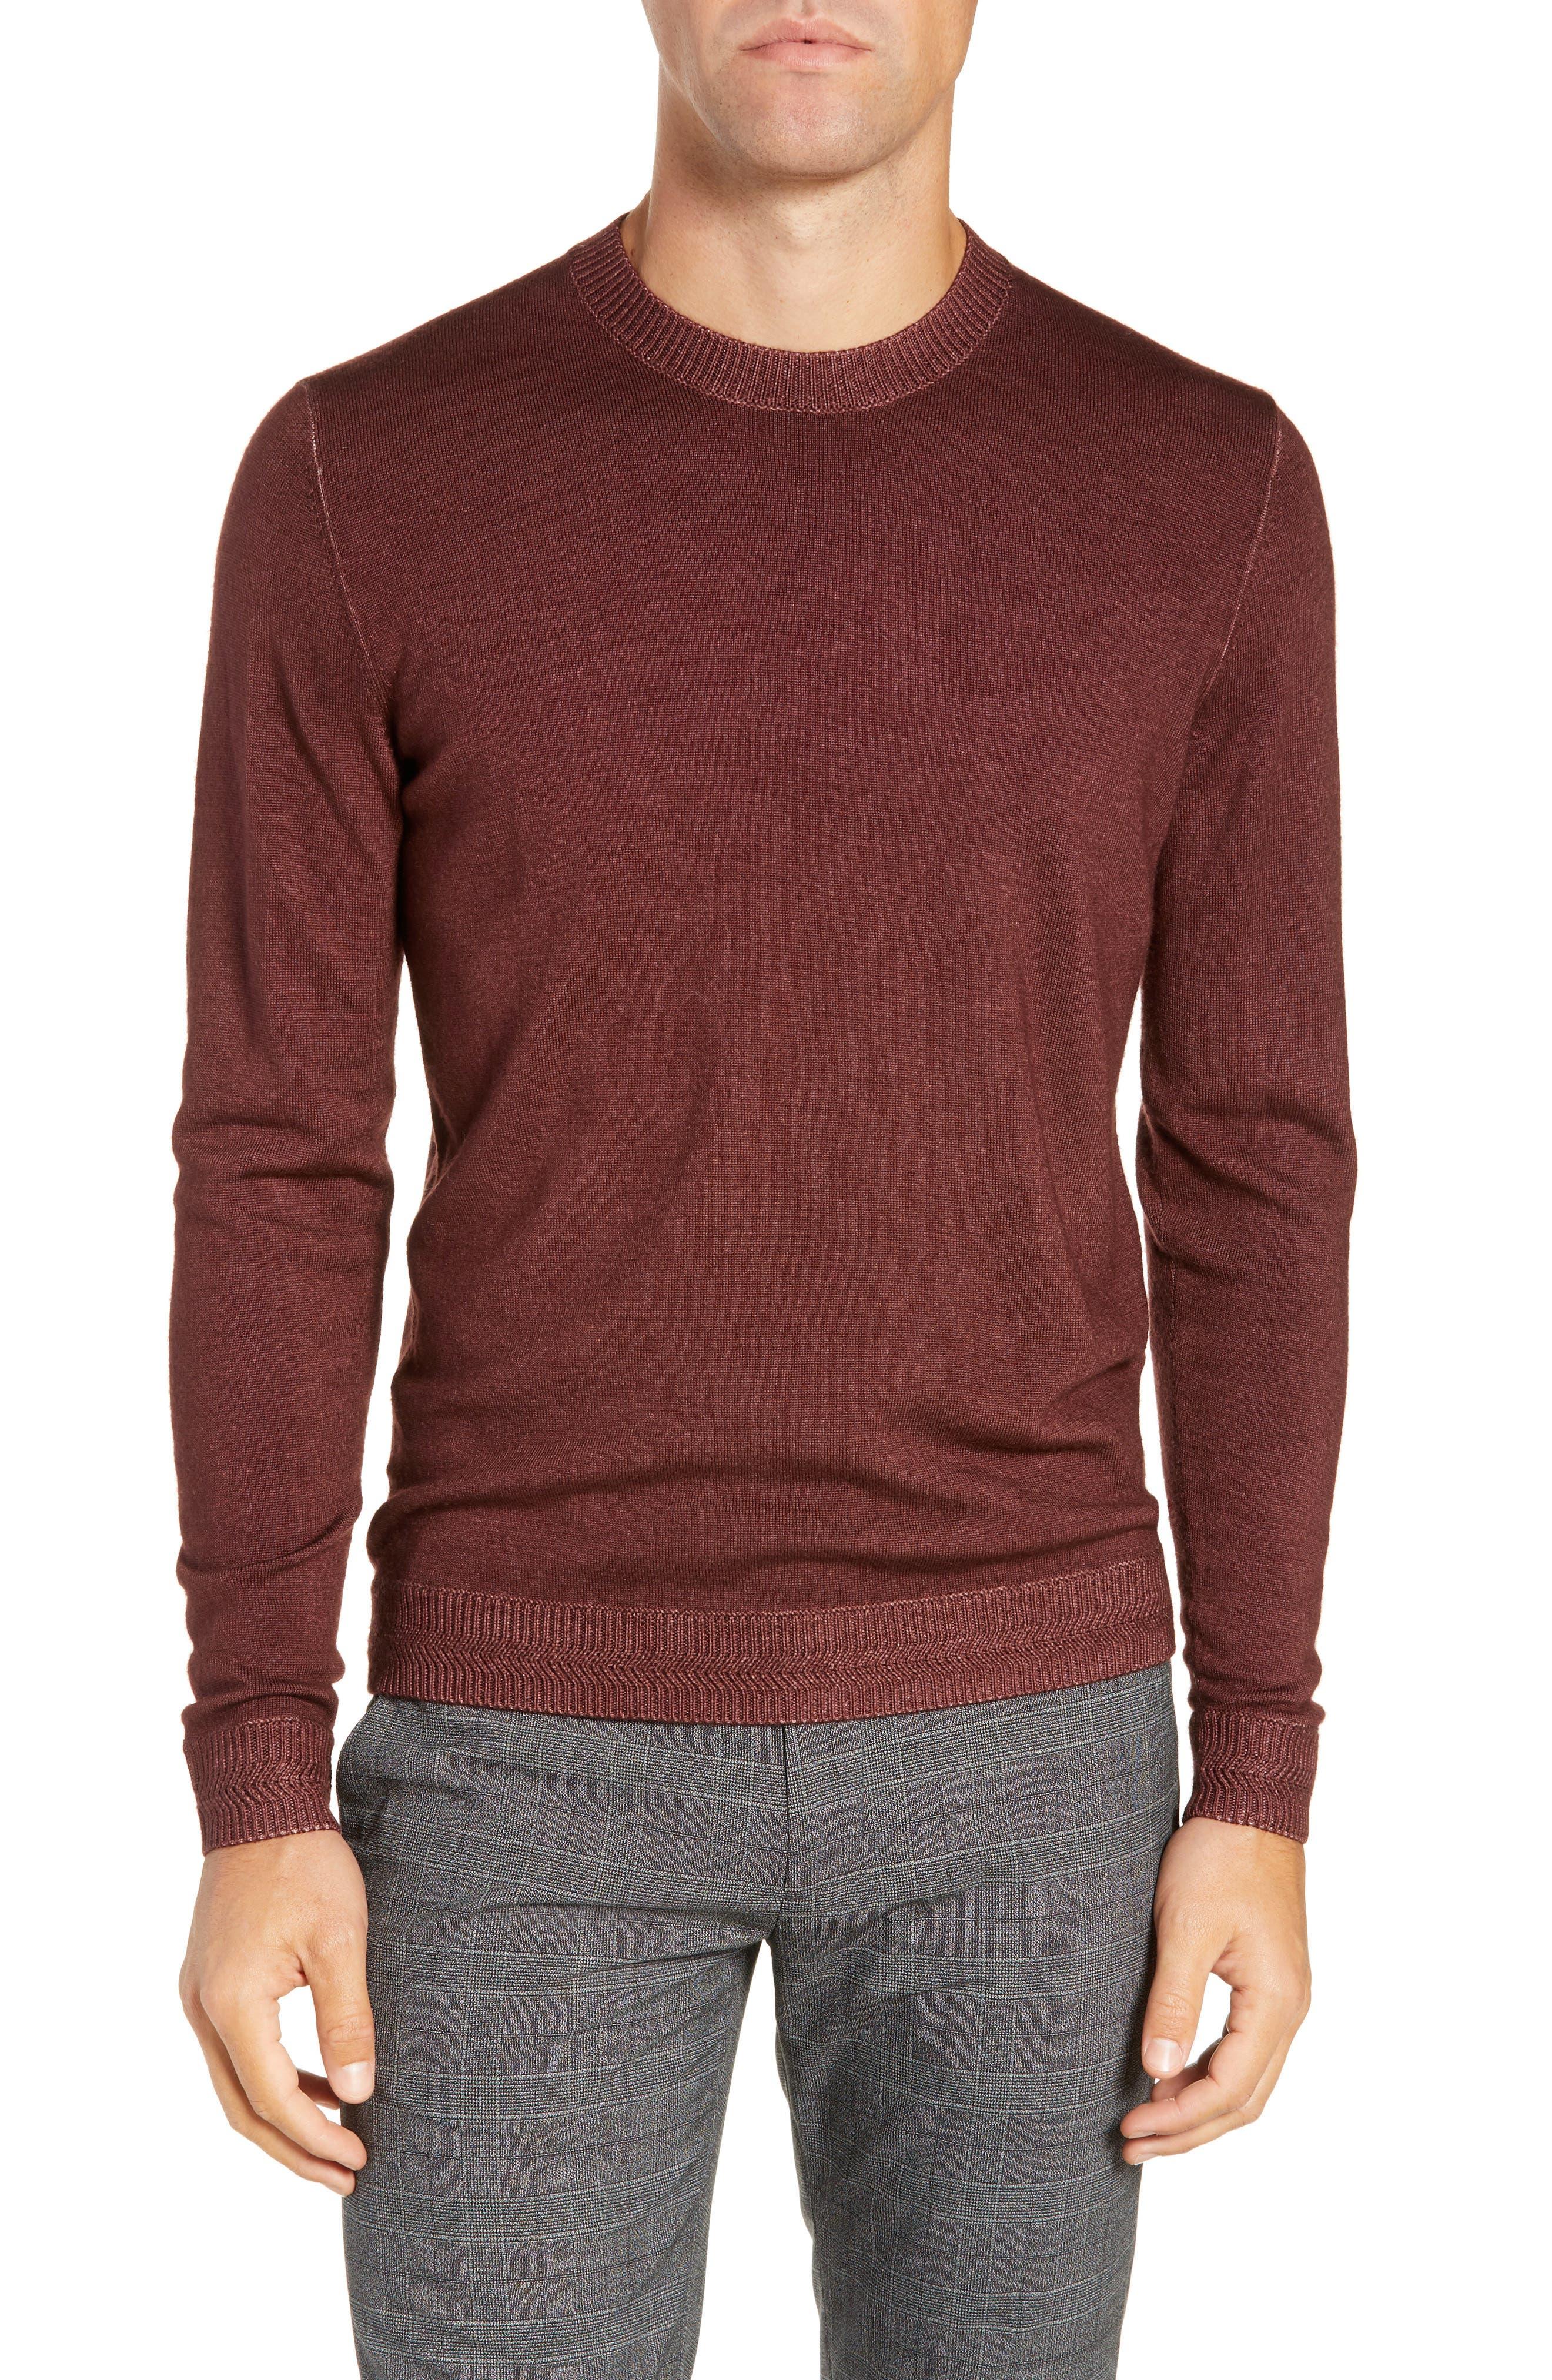 Trim Fit Newab Garment Dyed Wool Sweater,                             Main thumbnail 1, color,                             MAROON